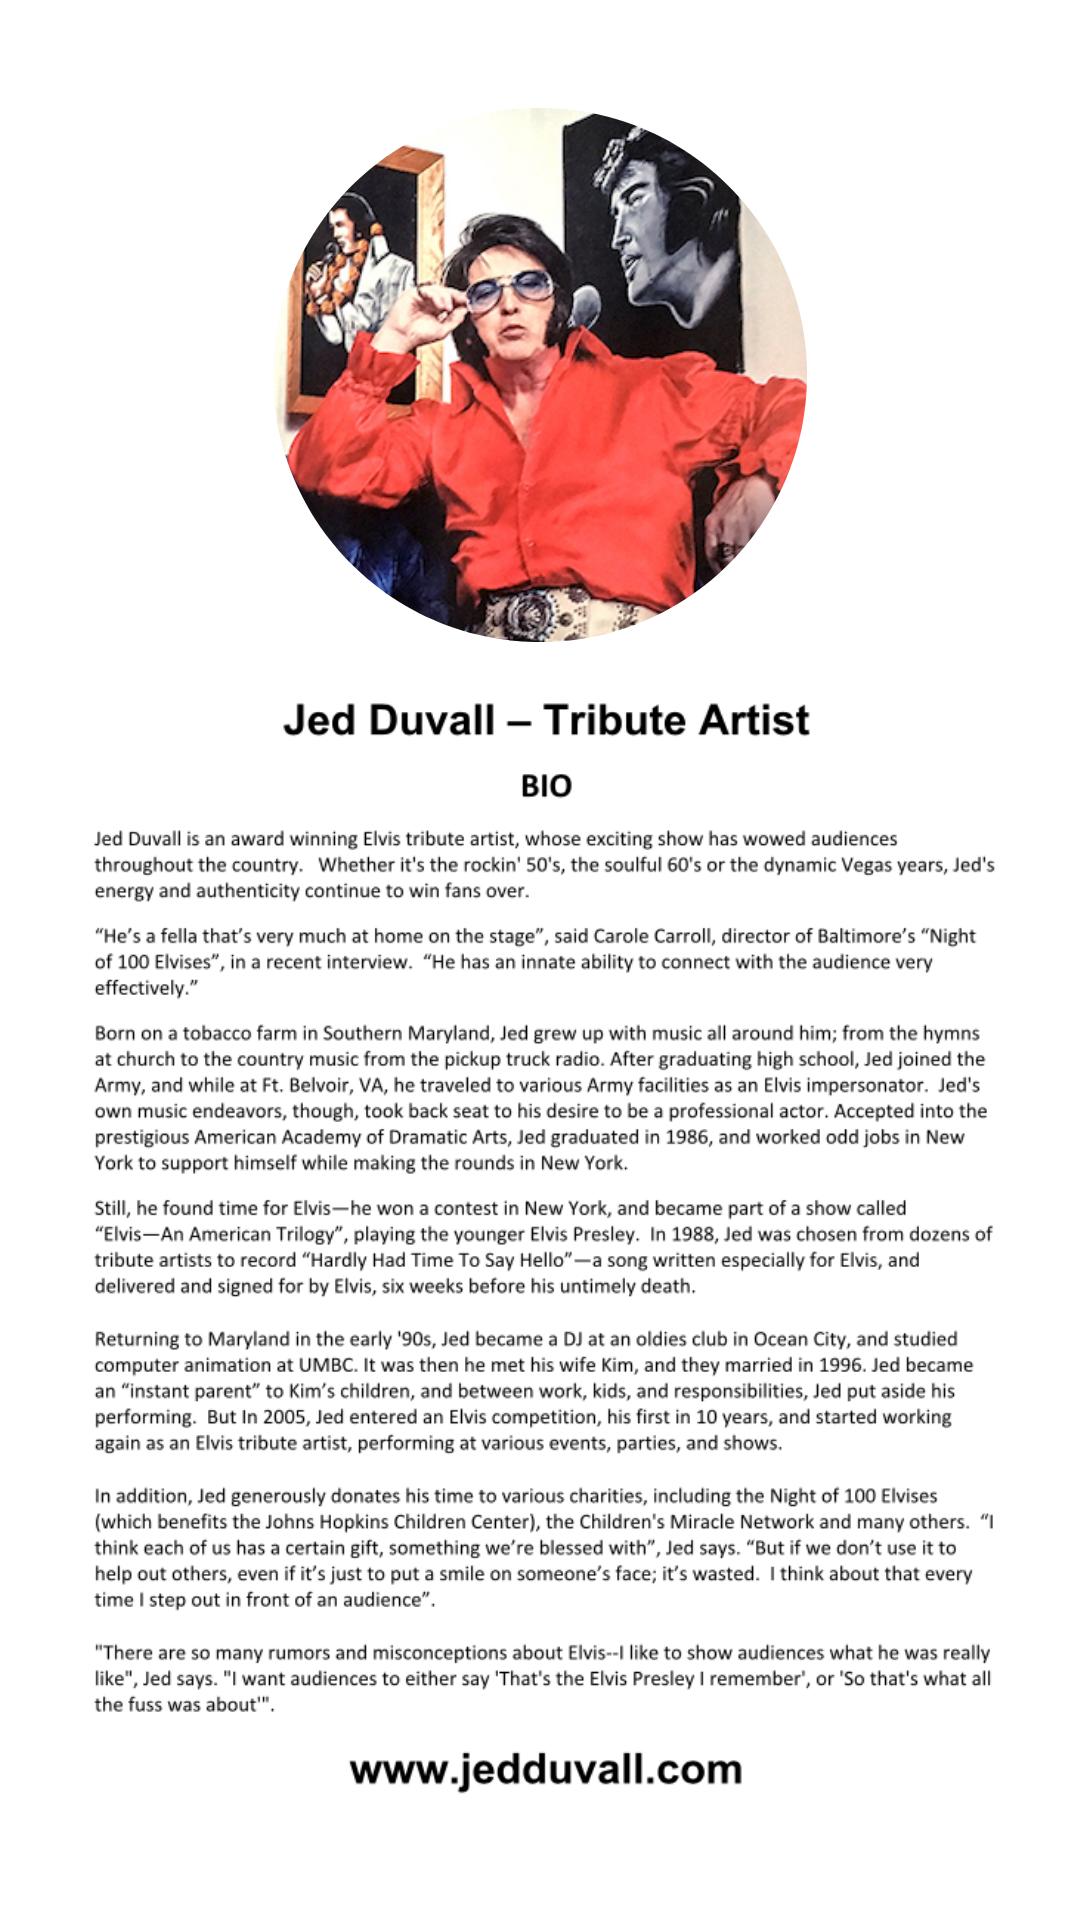 Jed Duvall Bio